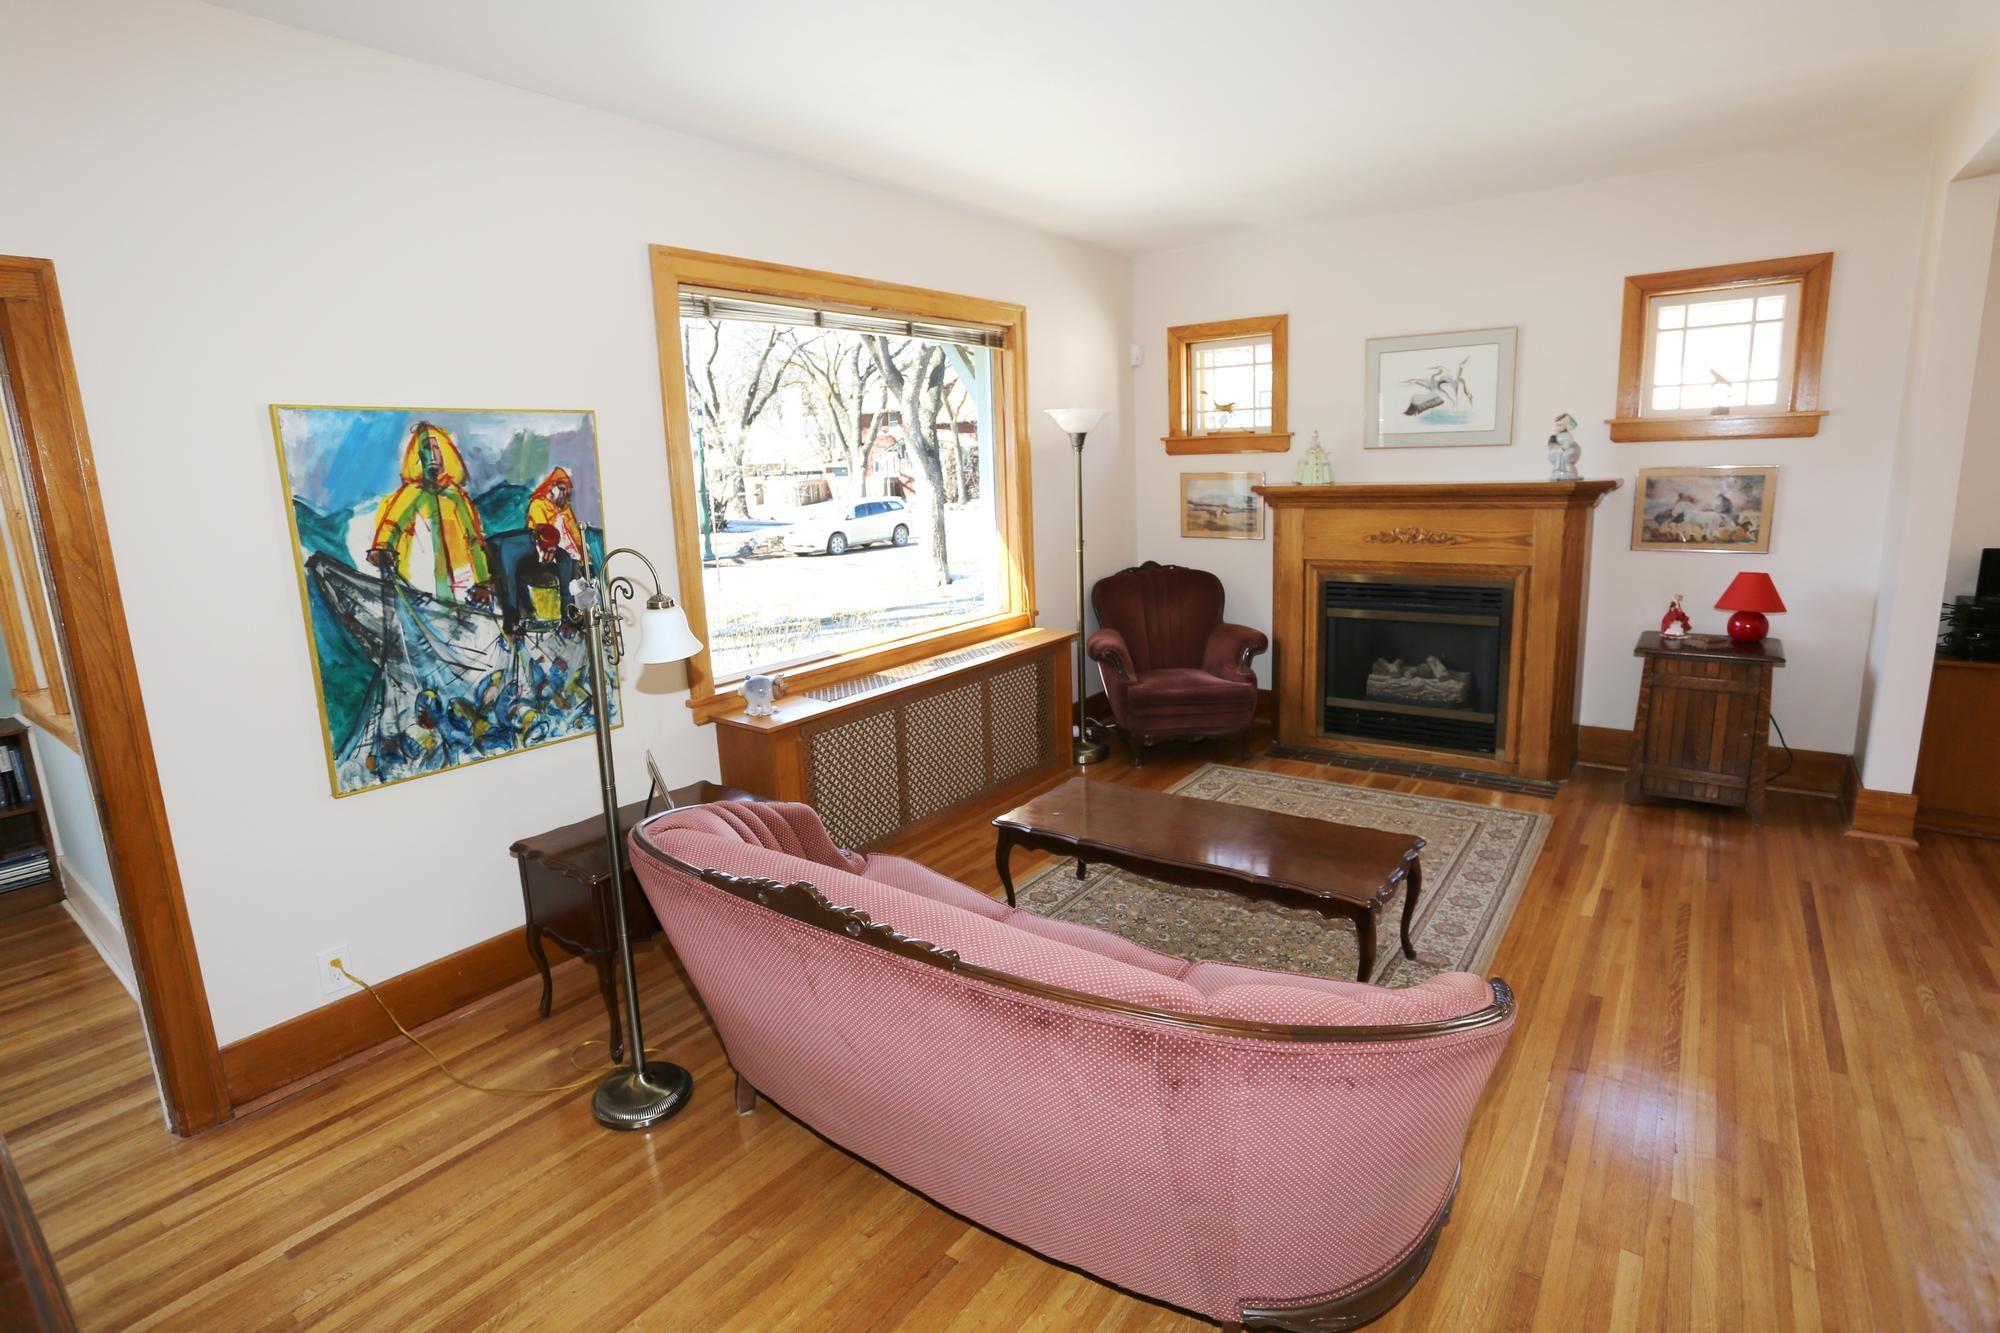 Photo 6: Photos: 109 Garfield Street South in Winnipeg: Wolseley Single Family Detached for sale (5B)  : MLS®# 1808340